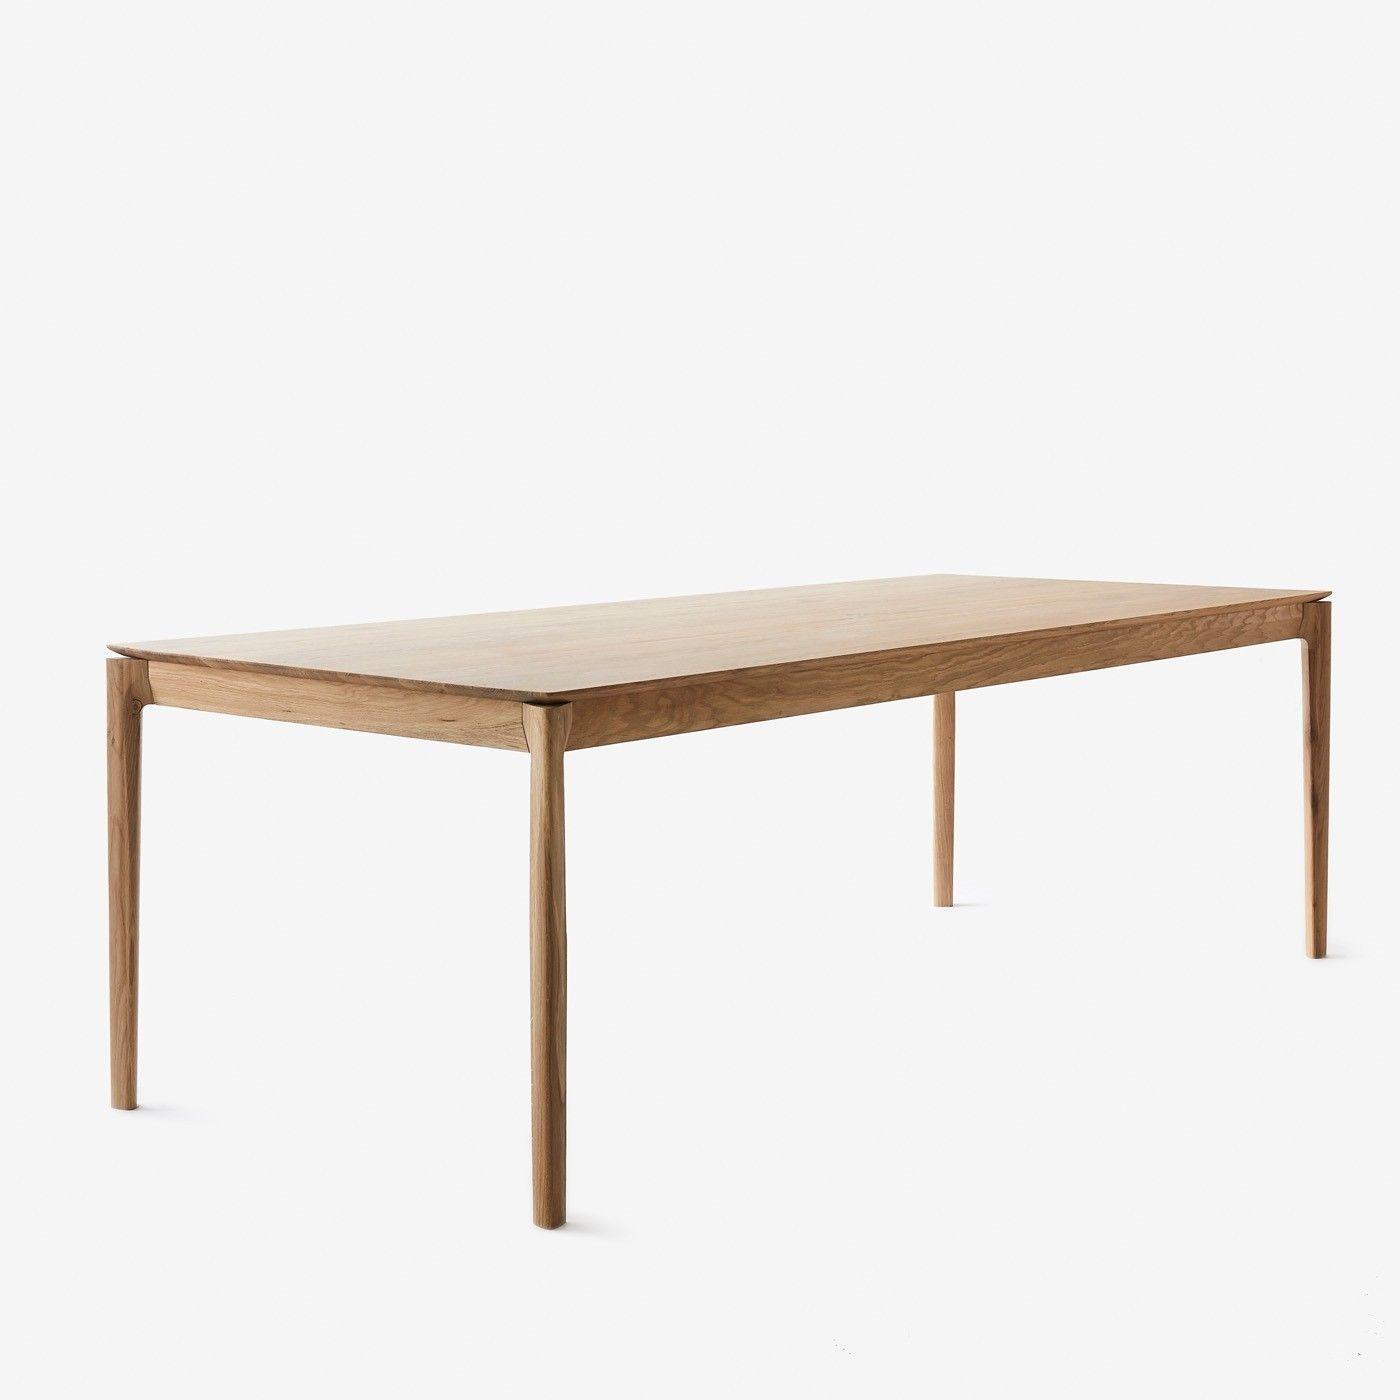 Kolmar Natural Dining Table 79 In 2020 Dining Table Oak Dining